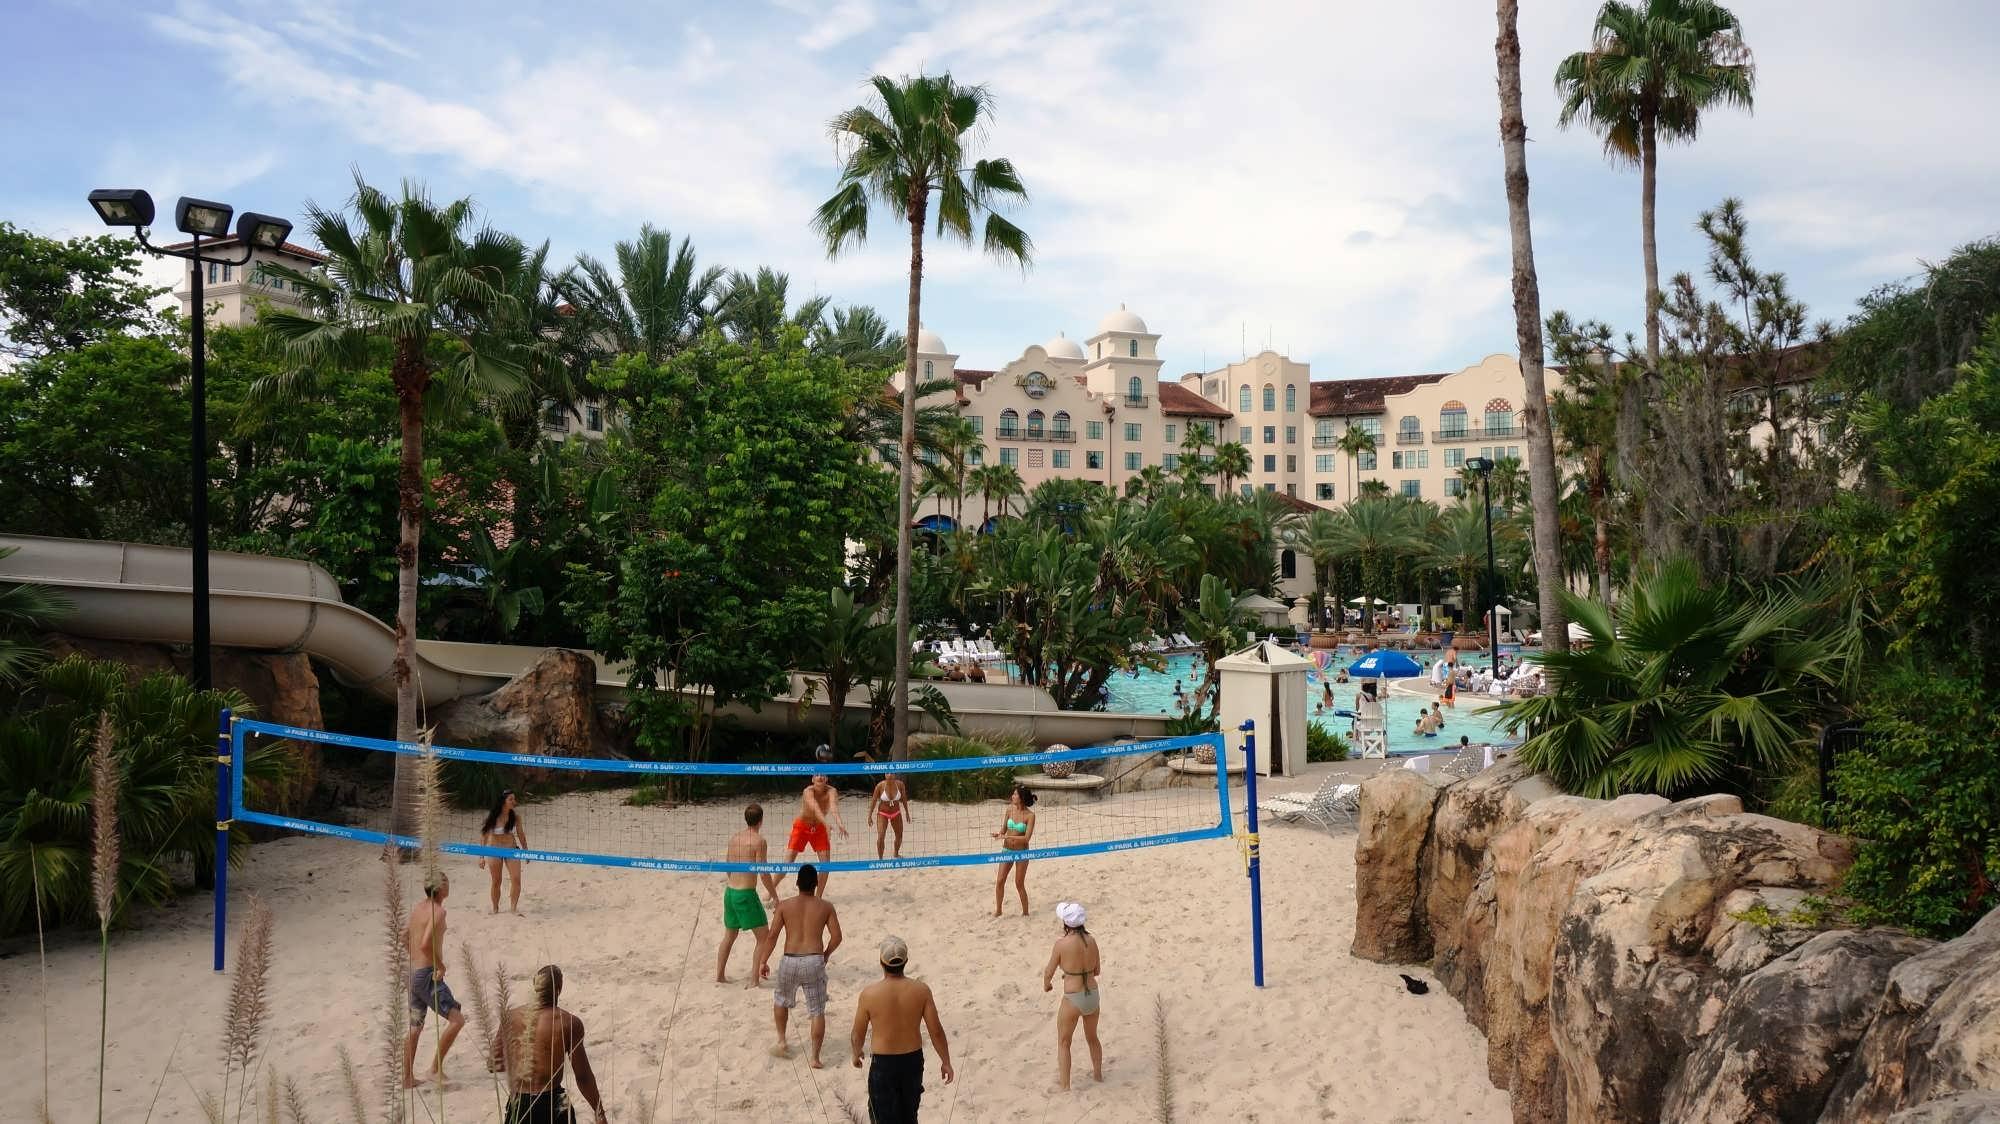 100 universal studios orlando in u adventures in pool for Pool show orlando